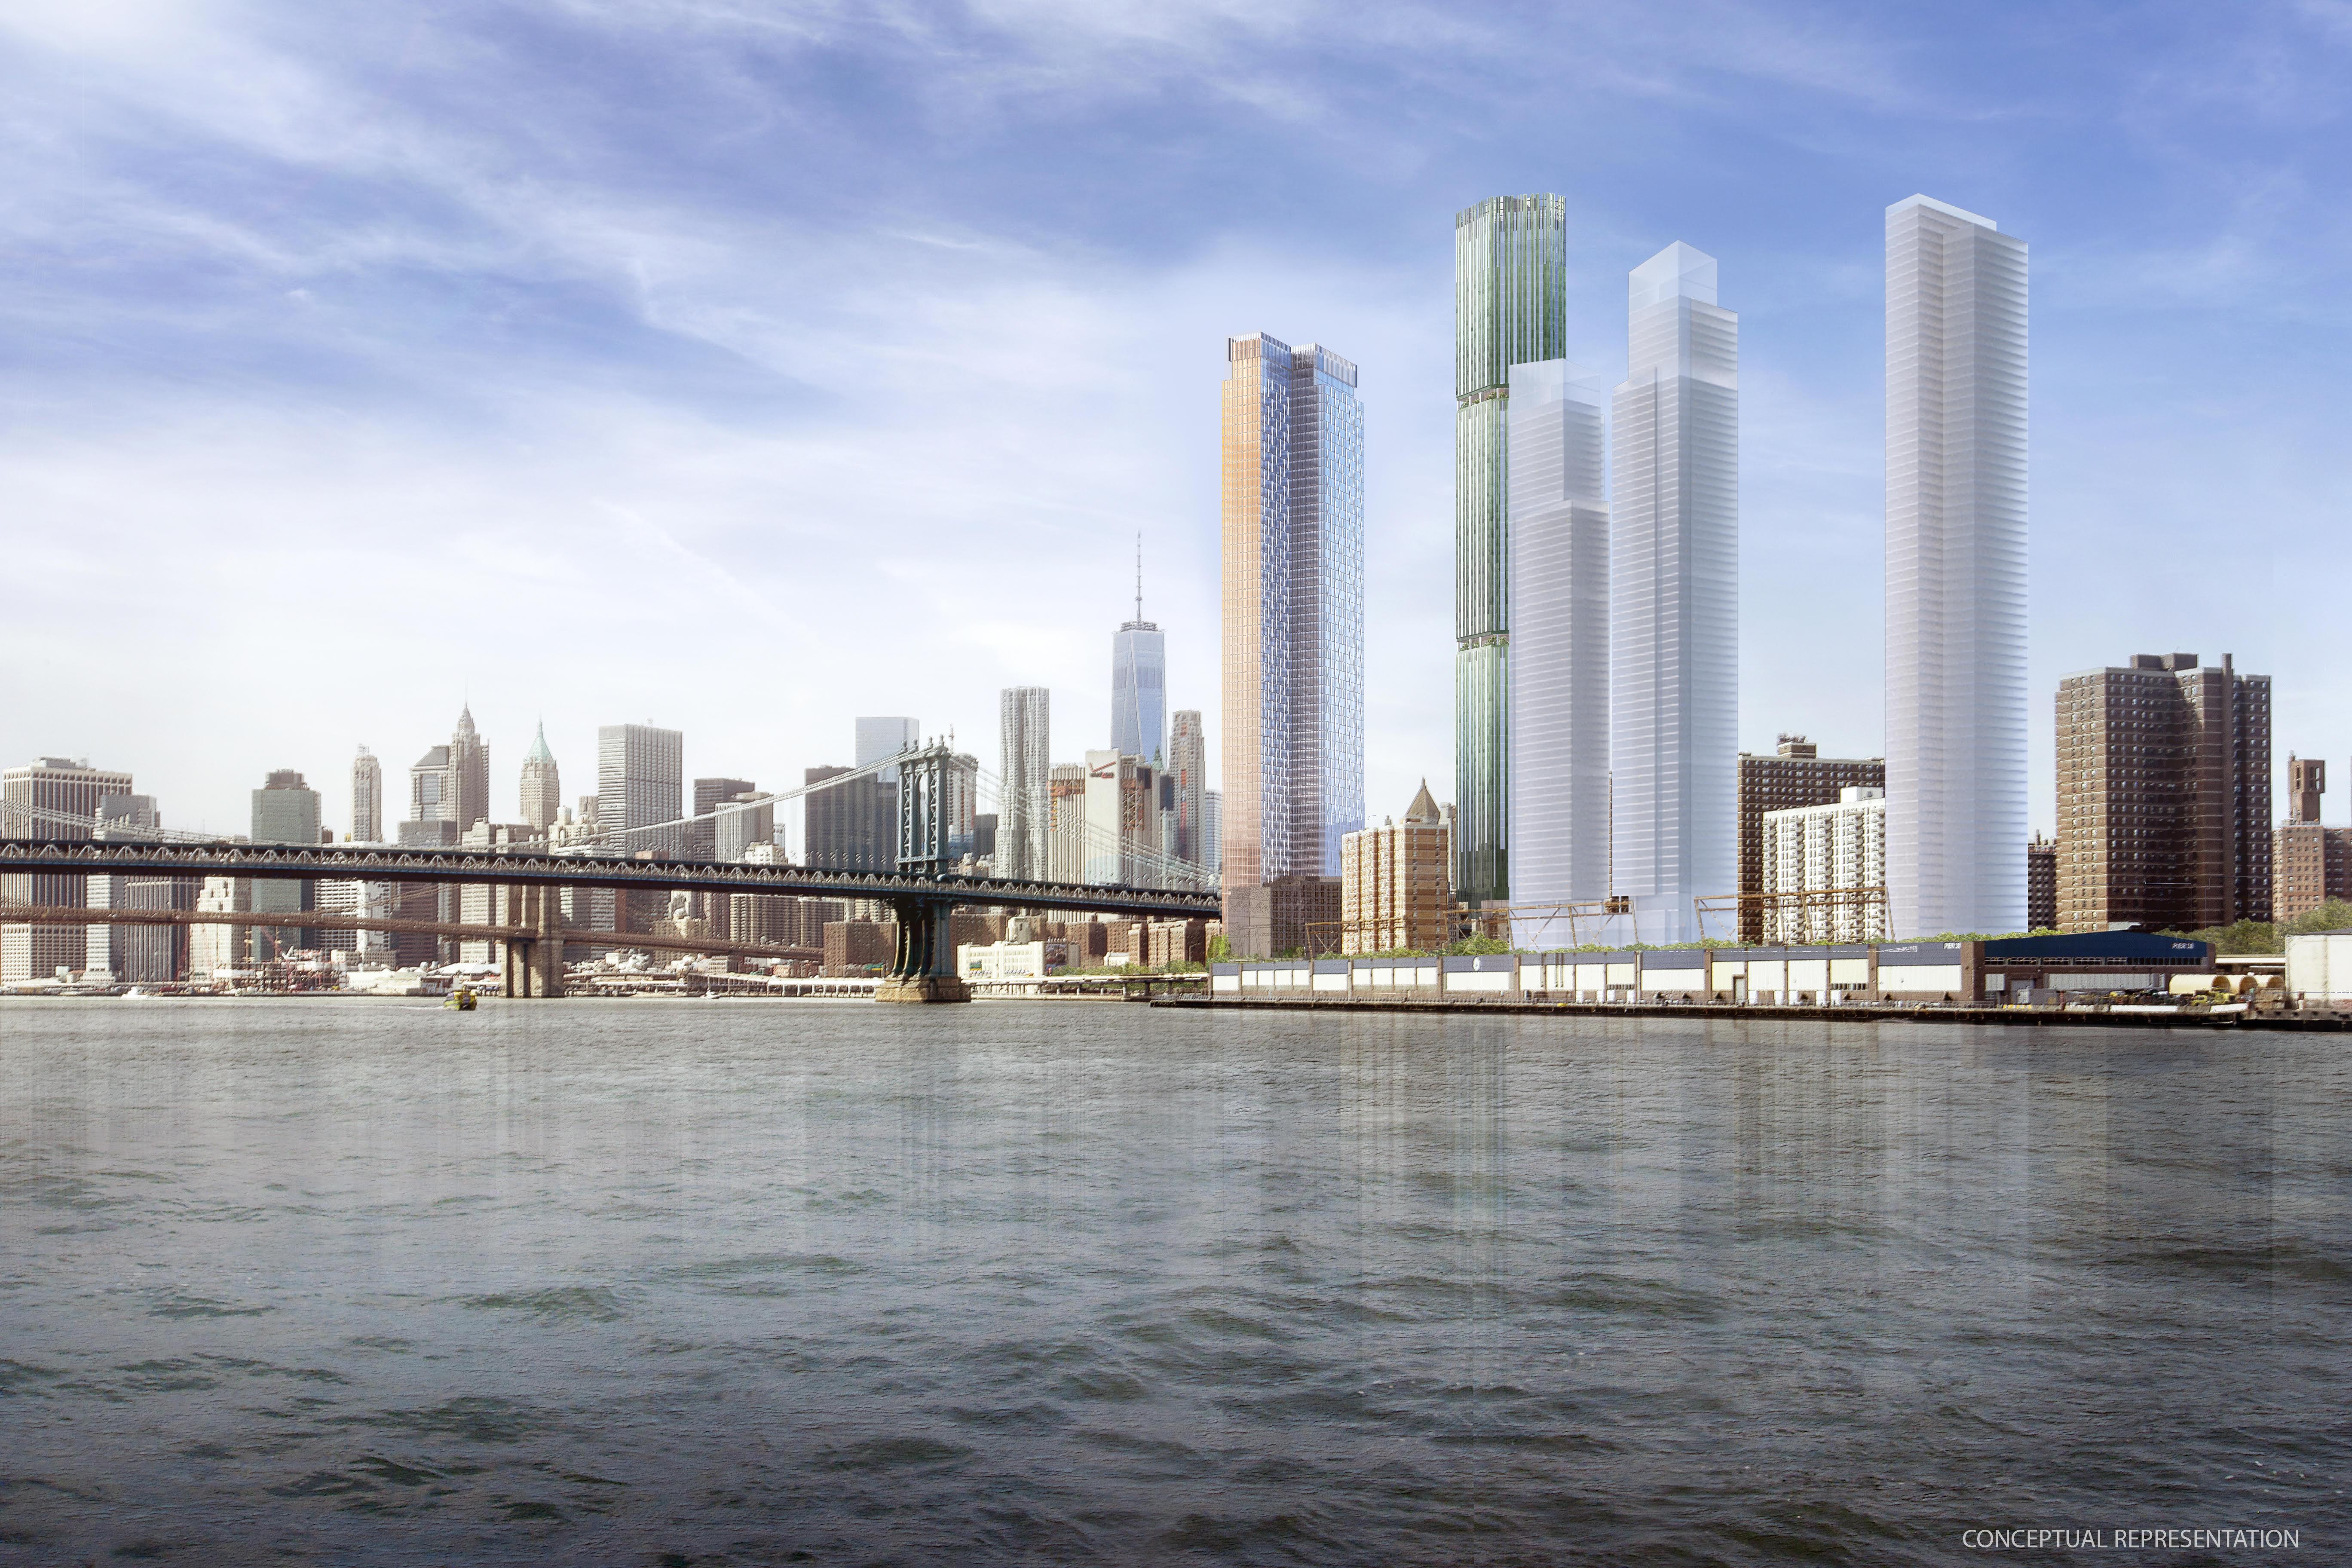 Two Bridges waterfront skyscrapers